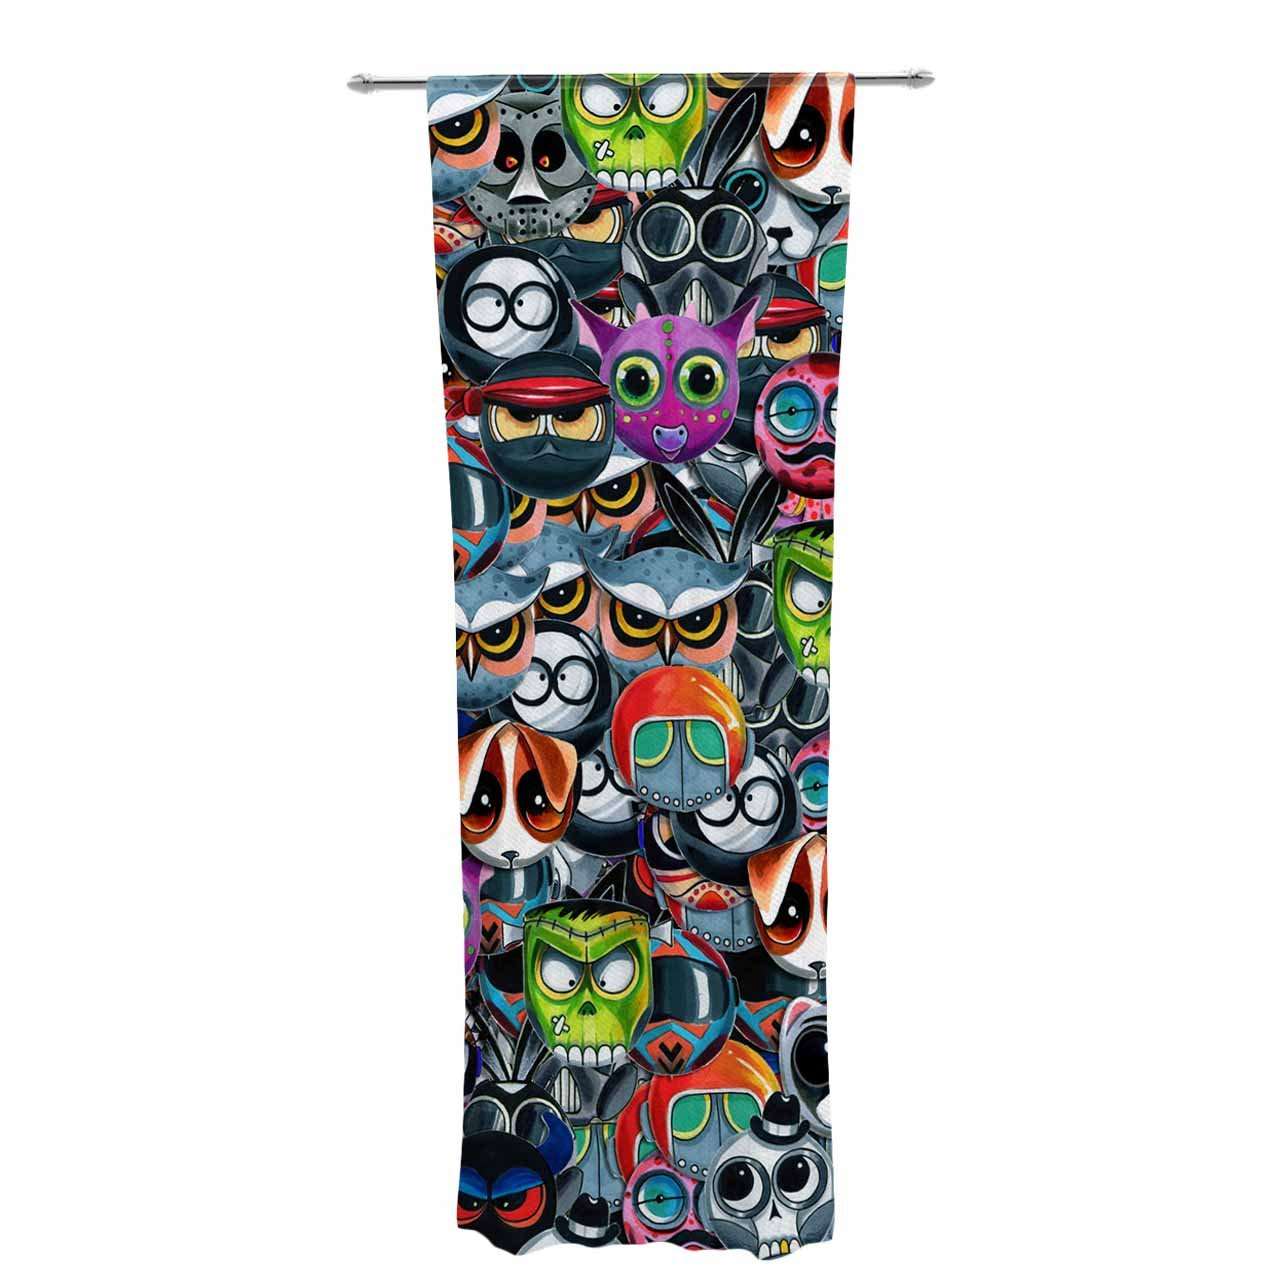 Kess InHouse Ivan Joh Holiday Chaos Sheer Curtains 30 x 84